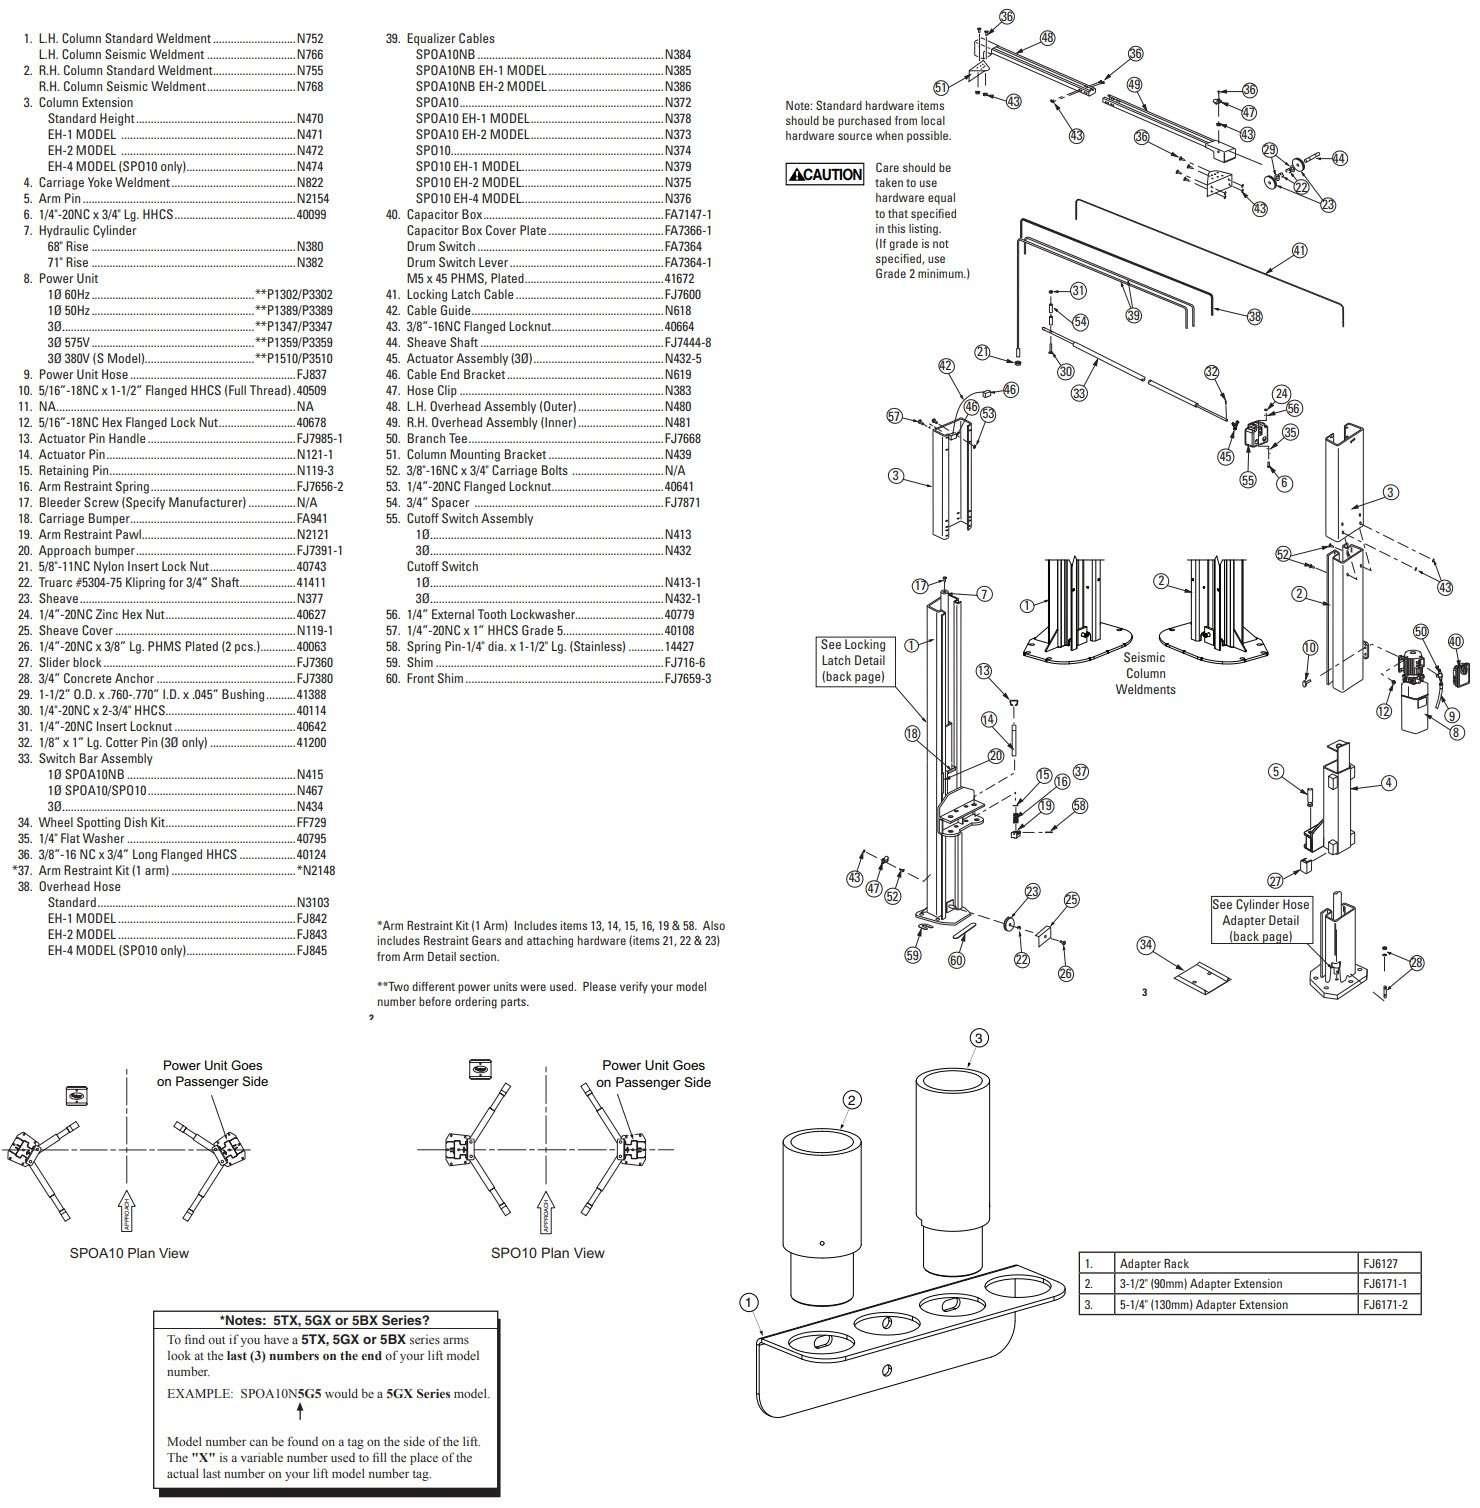 Rotary 2 post SPOA7 Parts Manual